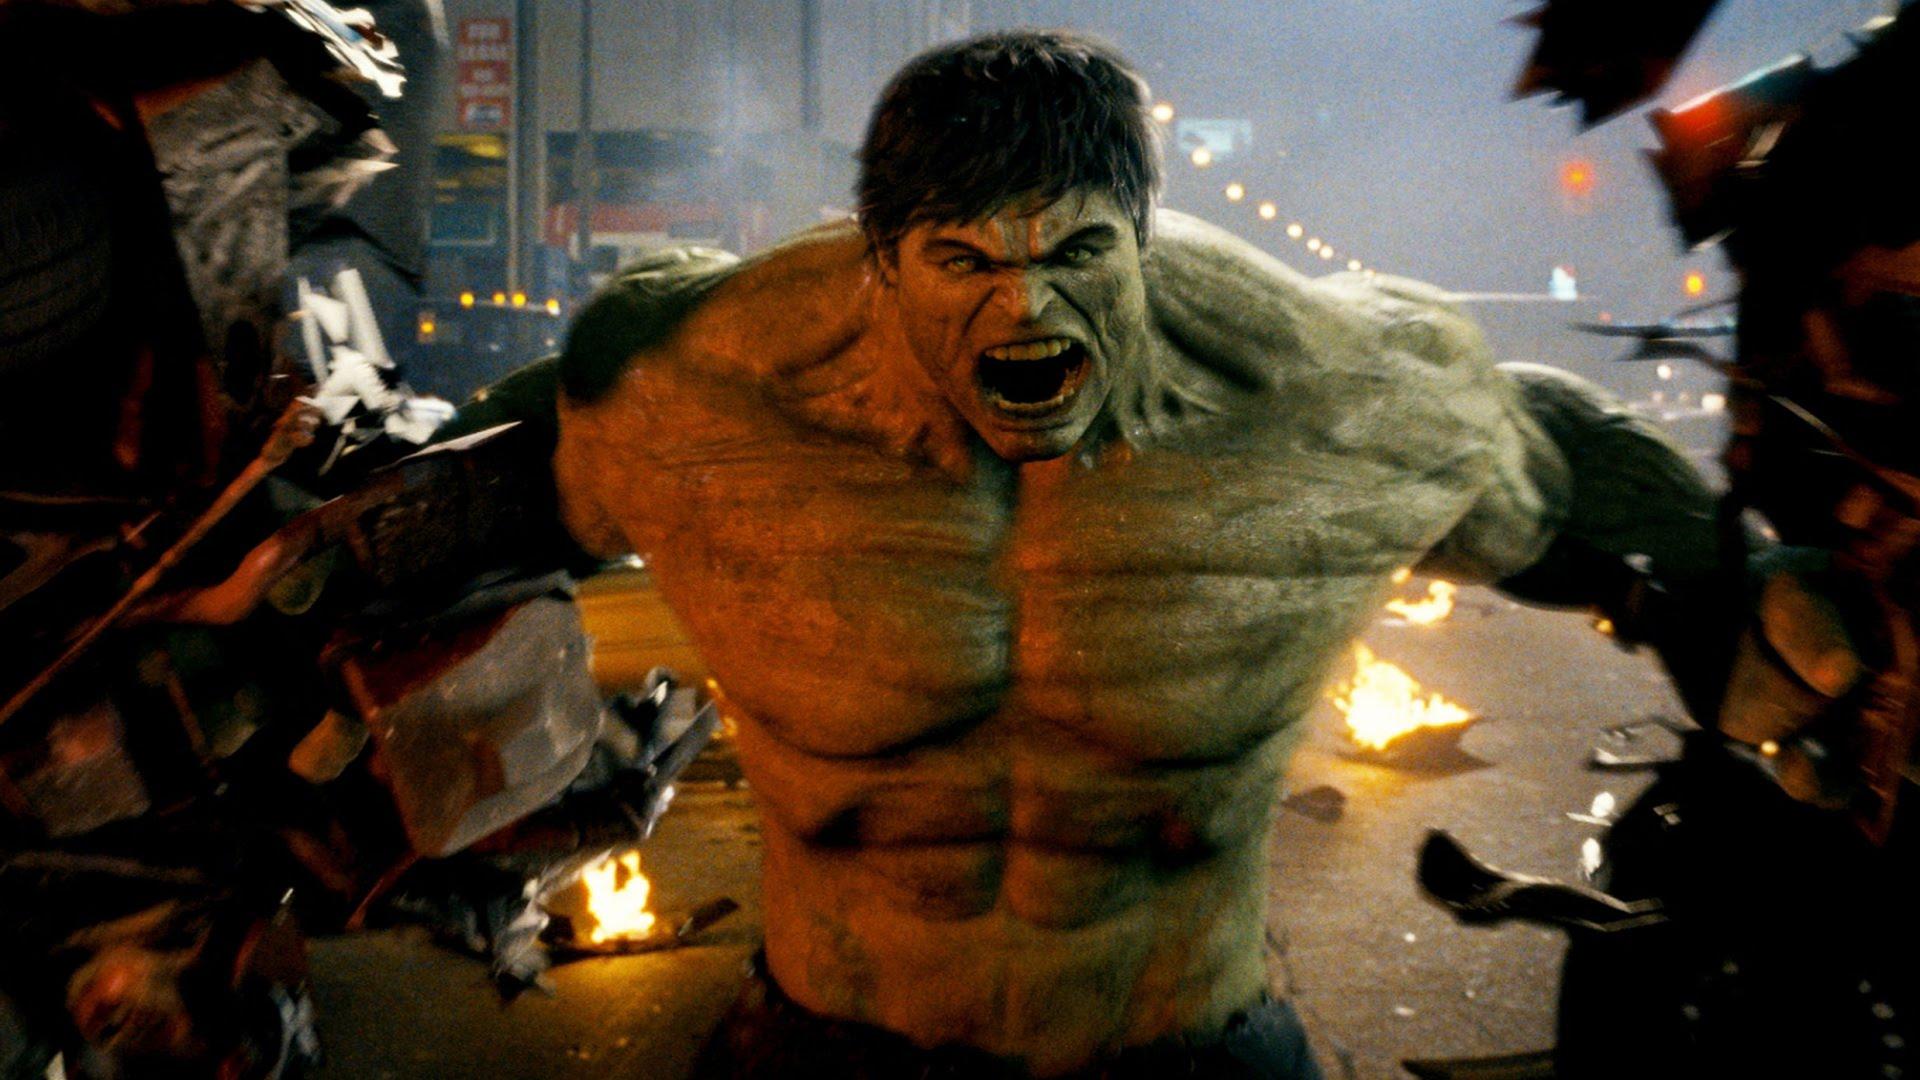 Edward Norton pół żartem, pół serio o słabym scenariuszu filmu Incredible Hulk